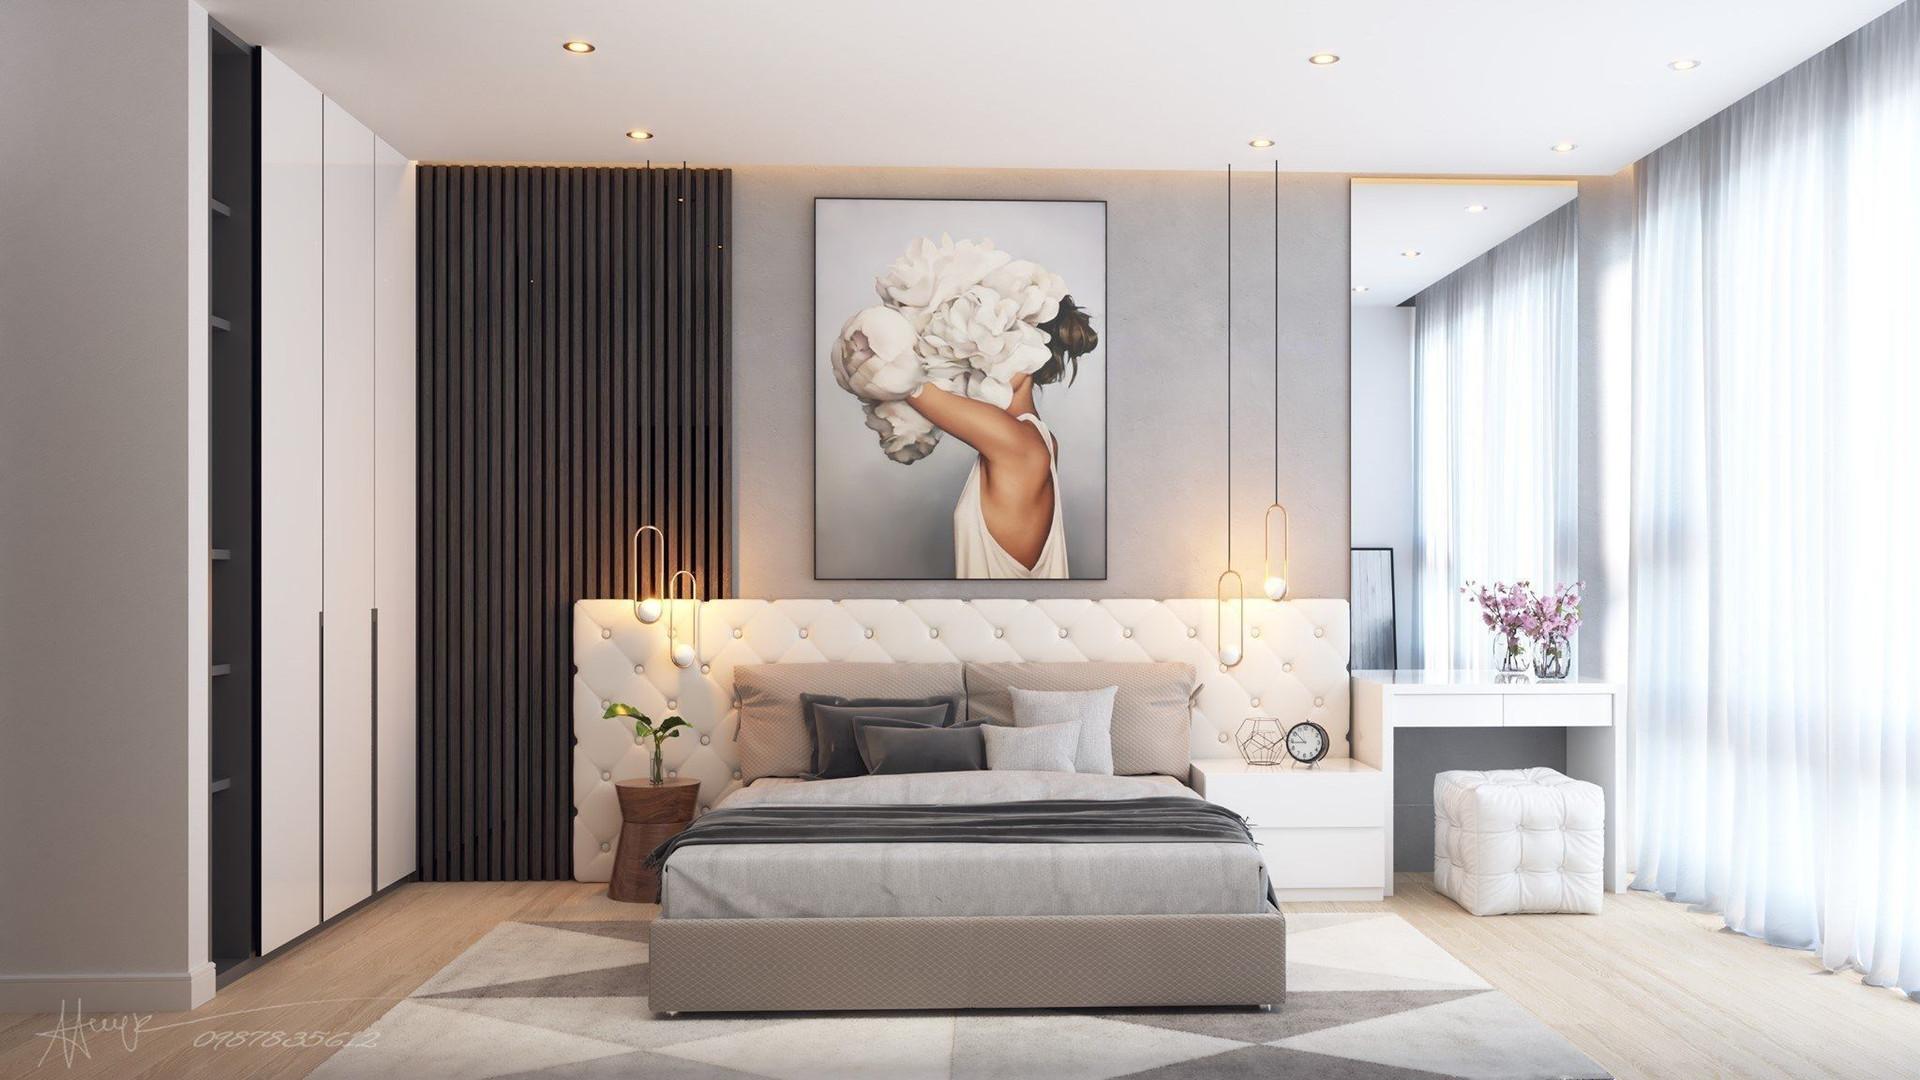 bedroom-design-3d-model-animated-rigged-